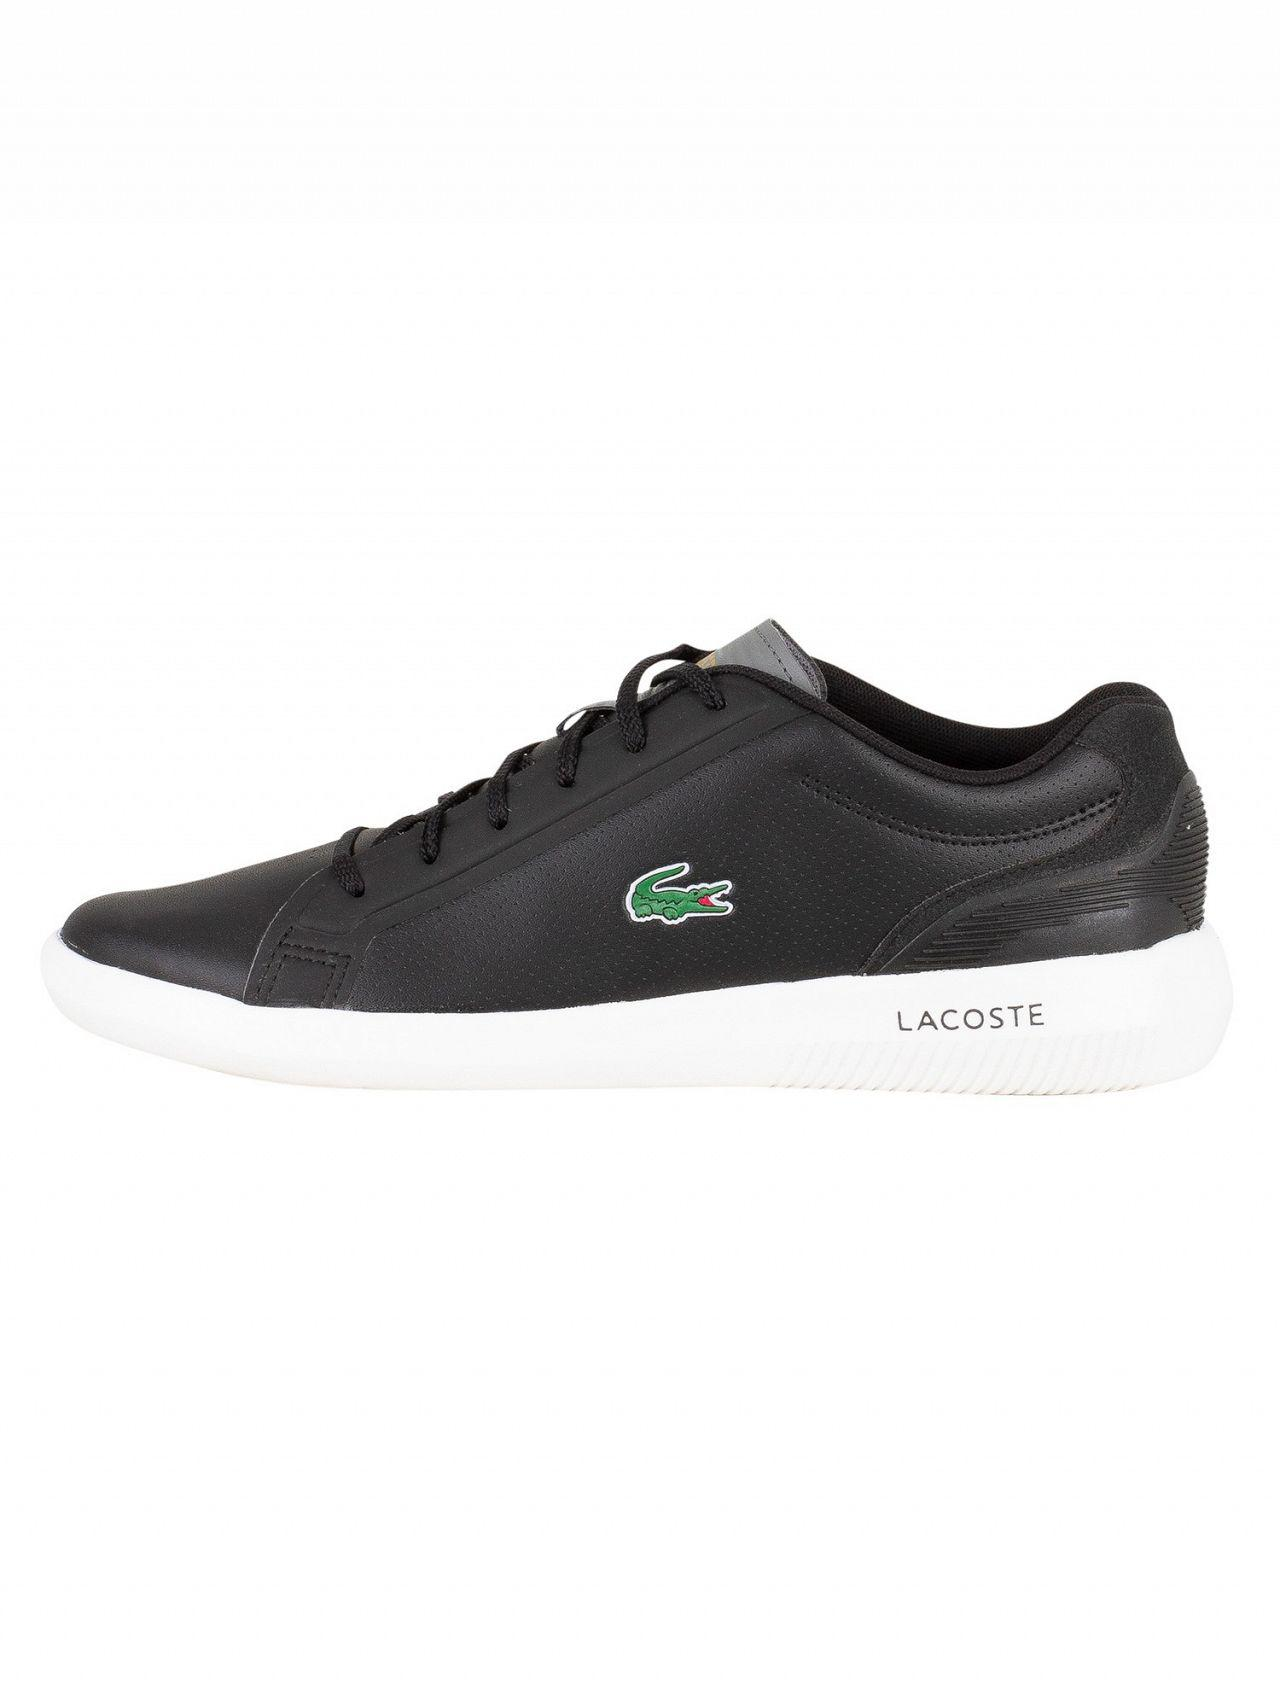 0db40595e700c4 Lyst - Lacoste Black dark Grey Avantor 318 3 Spm Trainers in Black ...